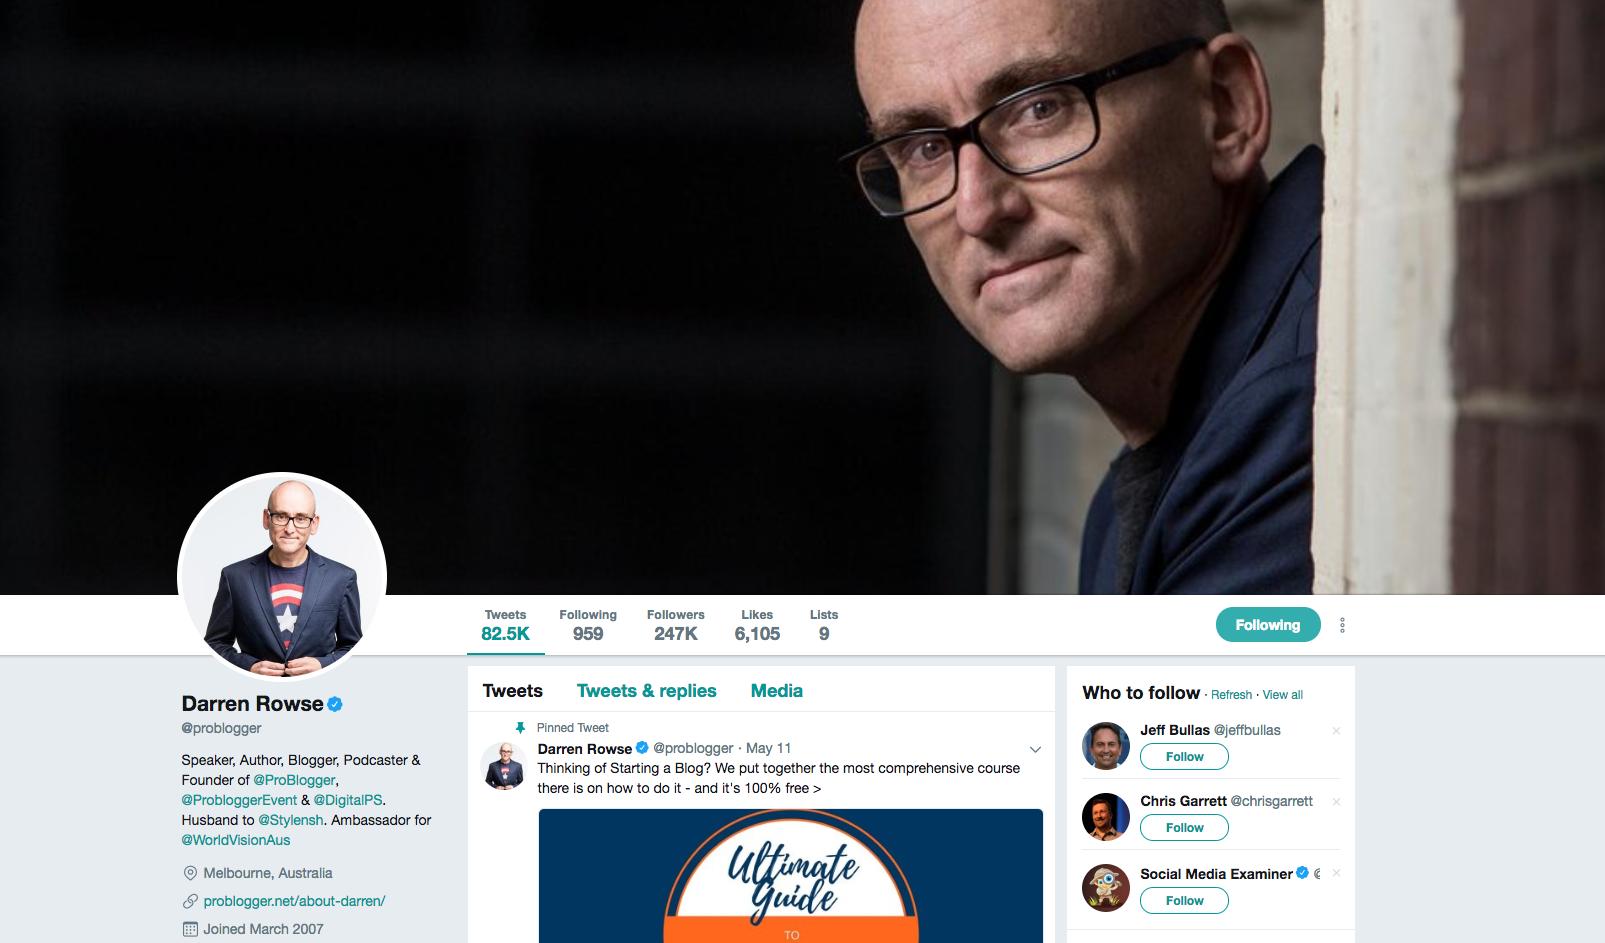 Darren Rowse top social media marketing influencers